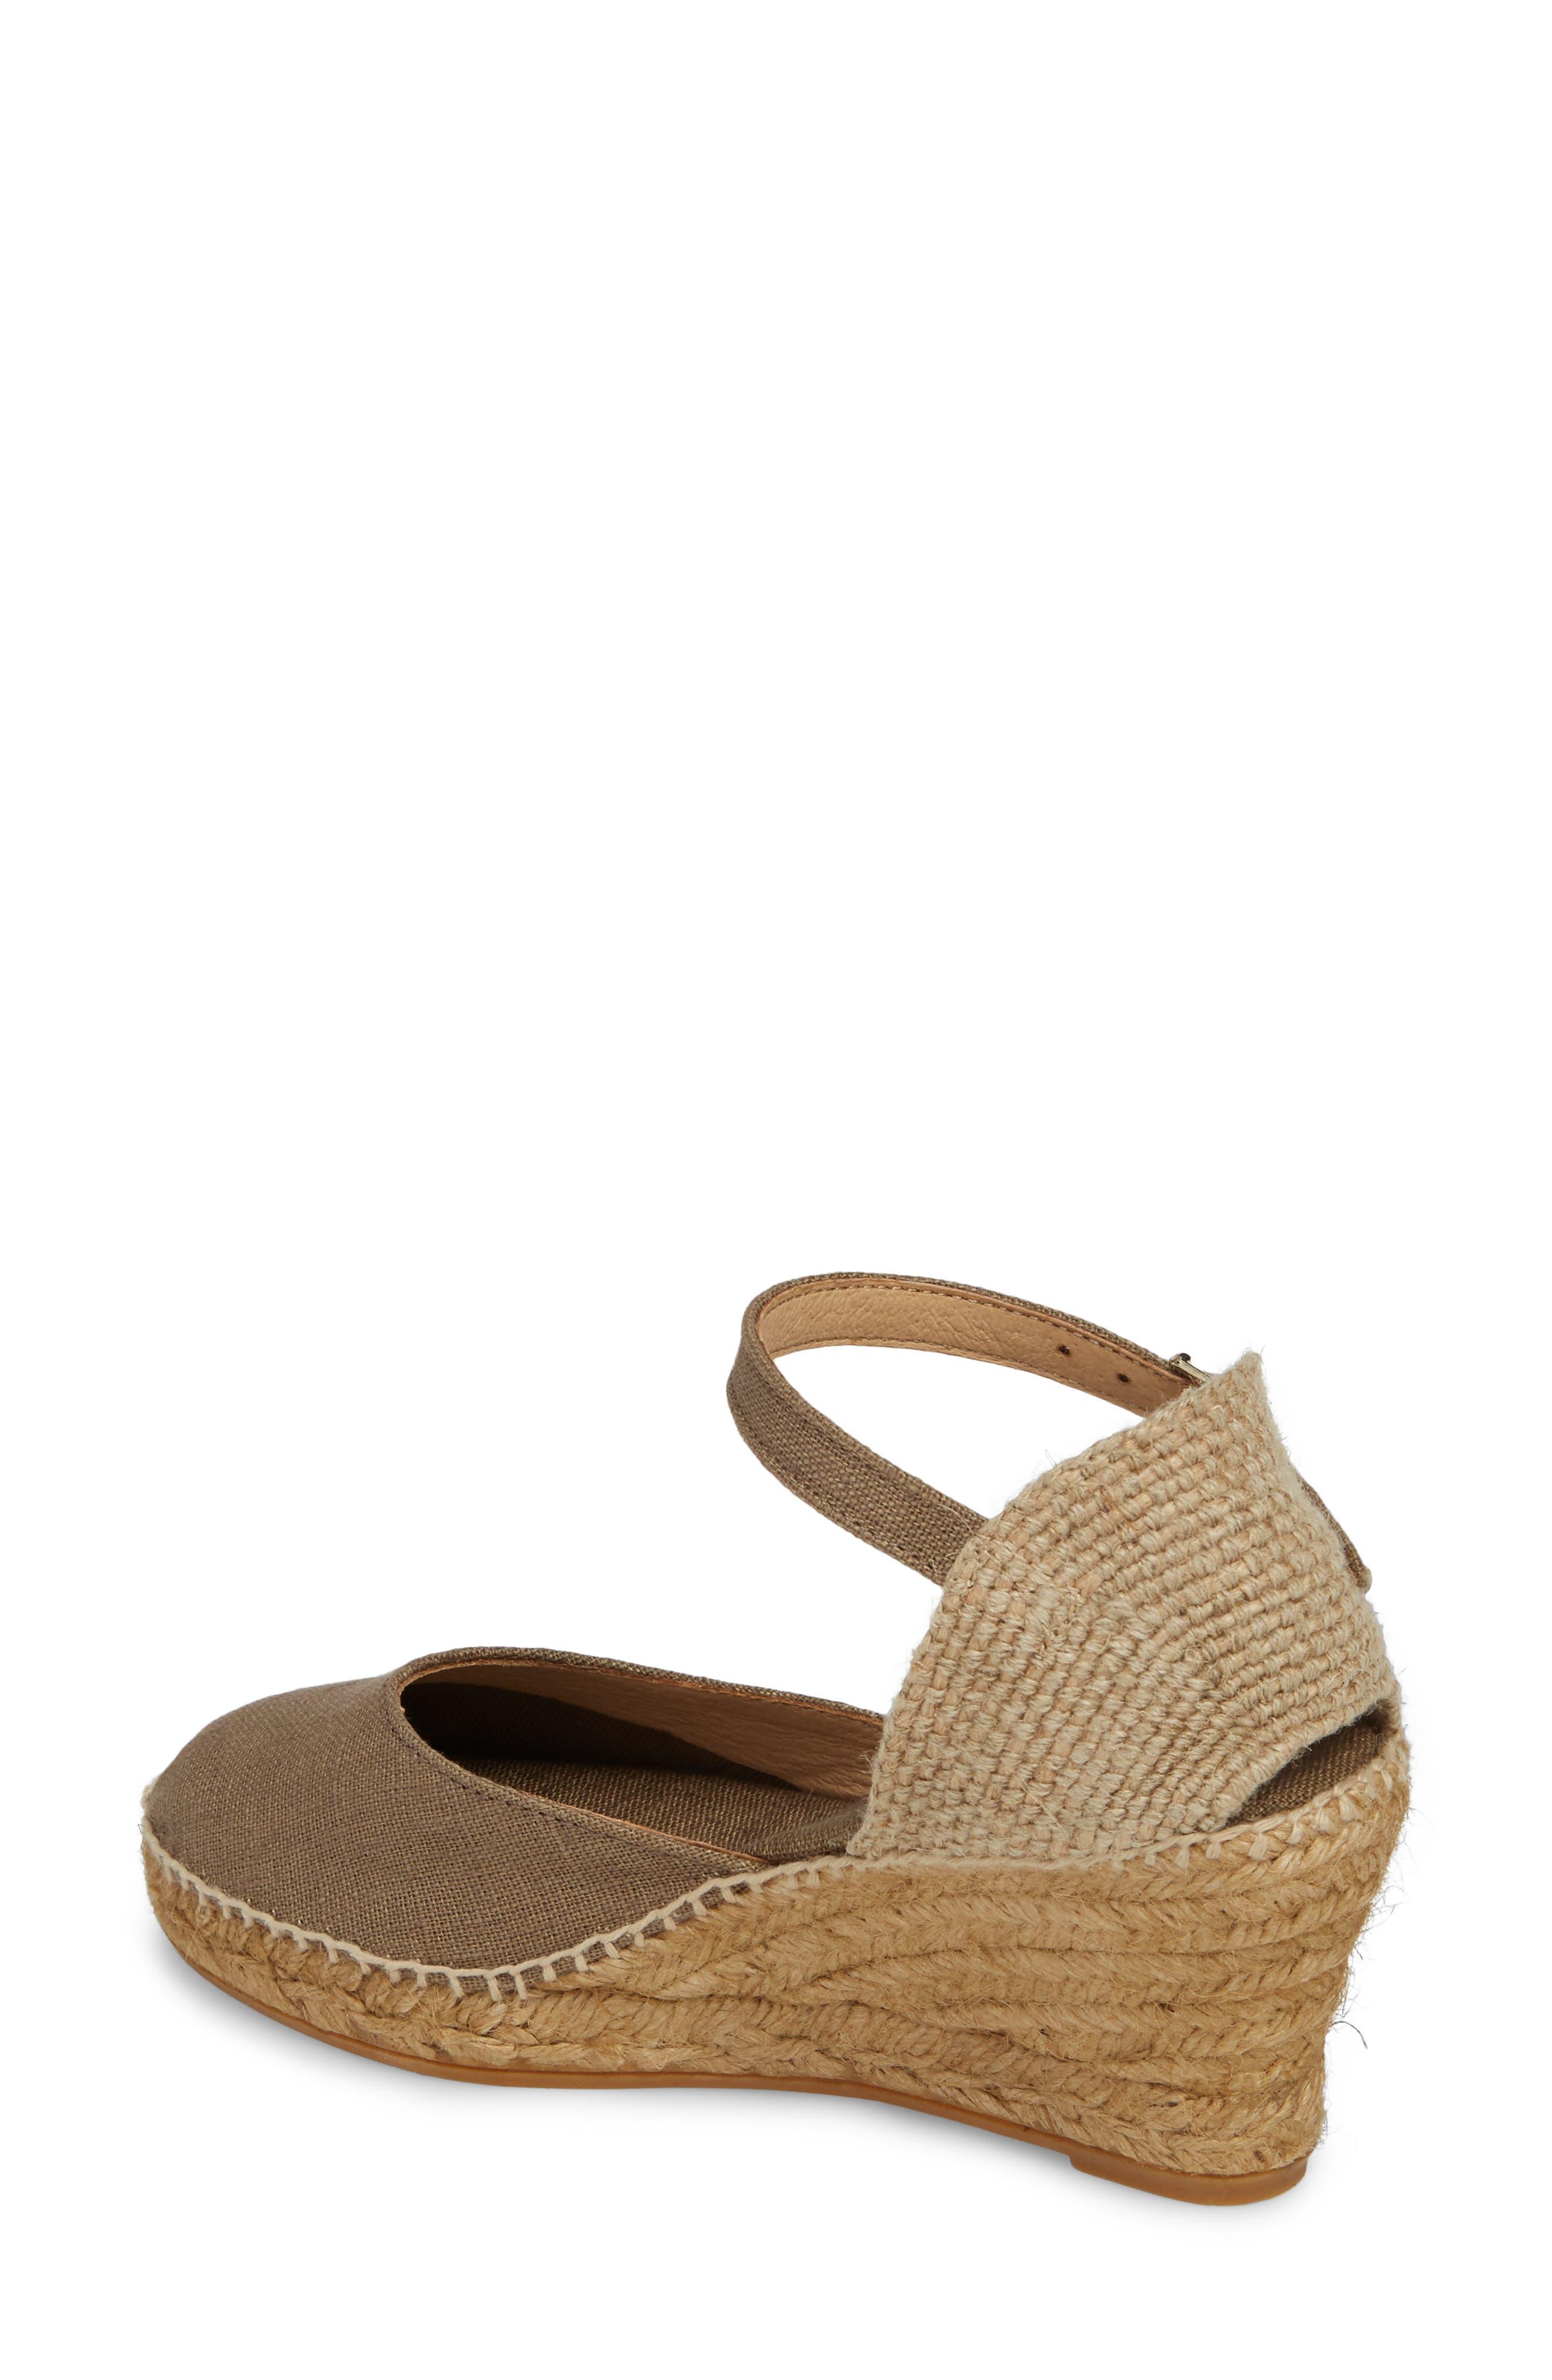 Alternate Image 2  - Toni Pons 'Caldes' Linen Wedge Sandal (Women)